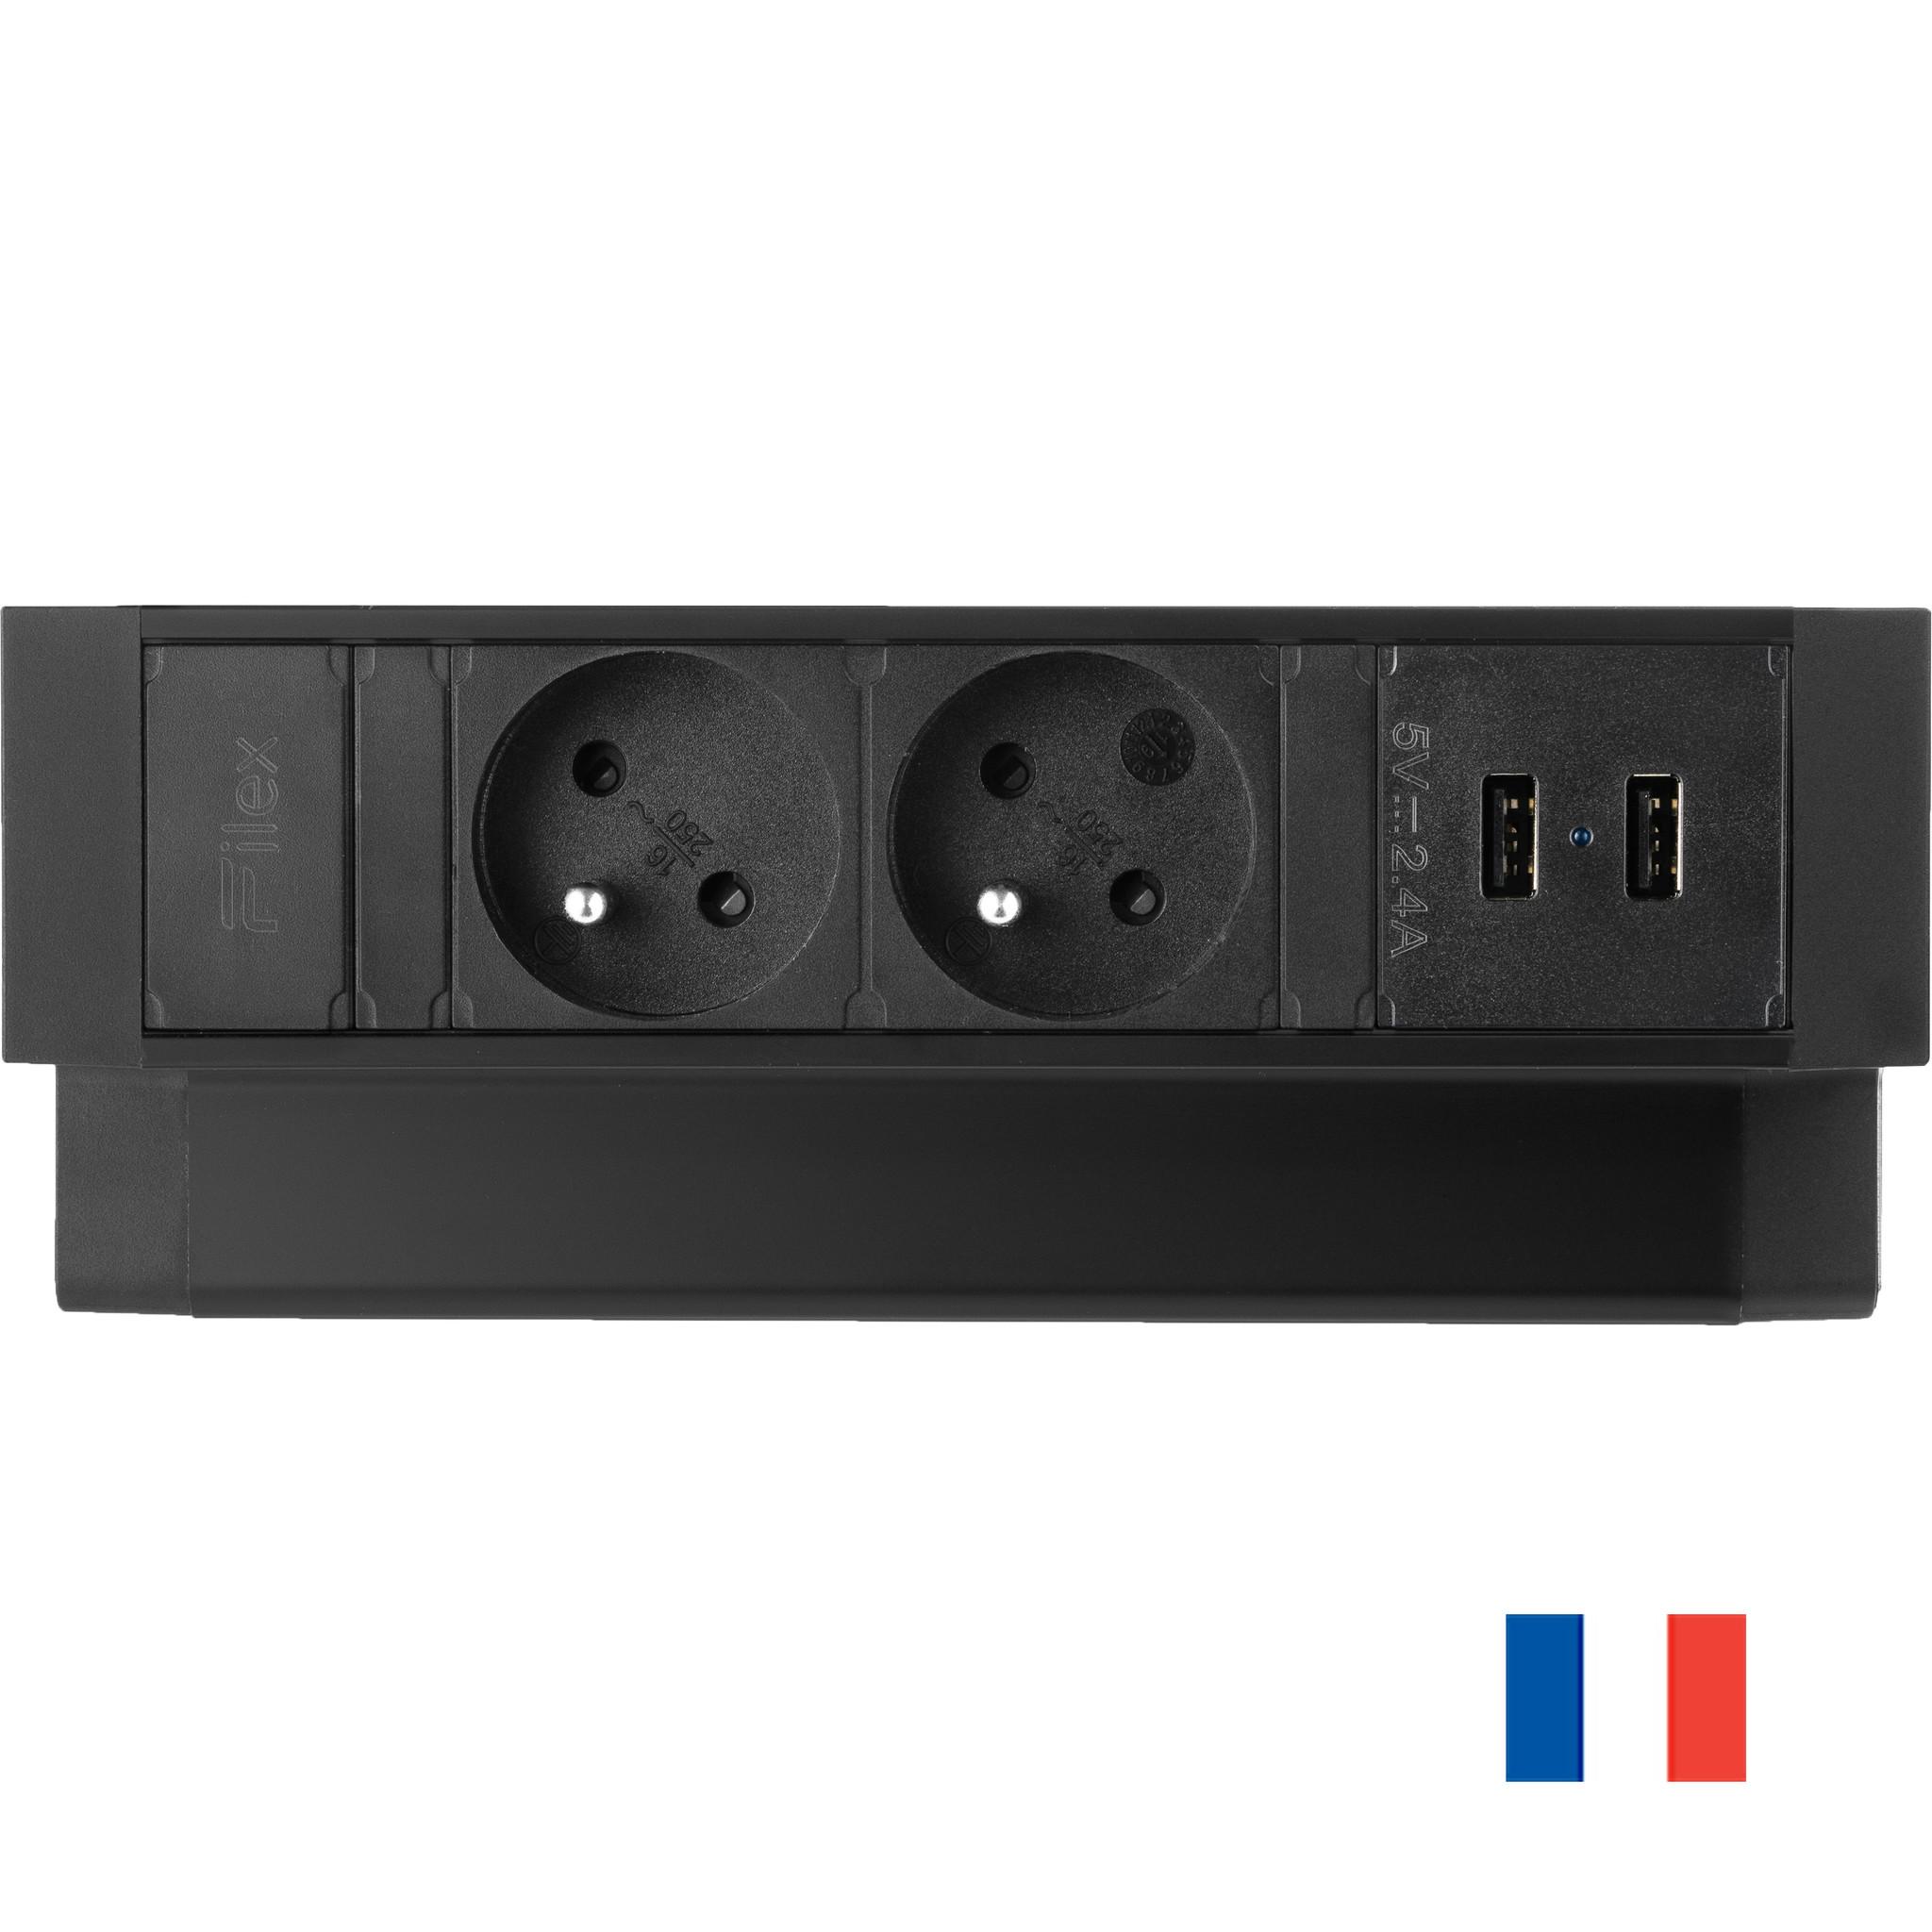 Ergopro Desk Up 2.0 - 2x penaarde power & 2x USB charger zwart